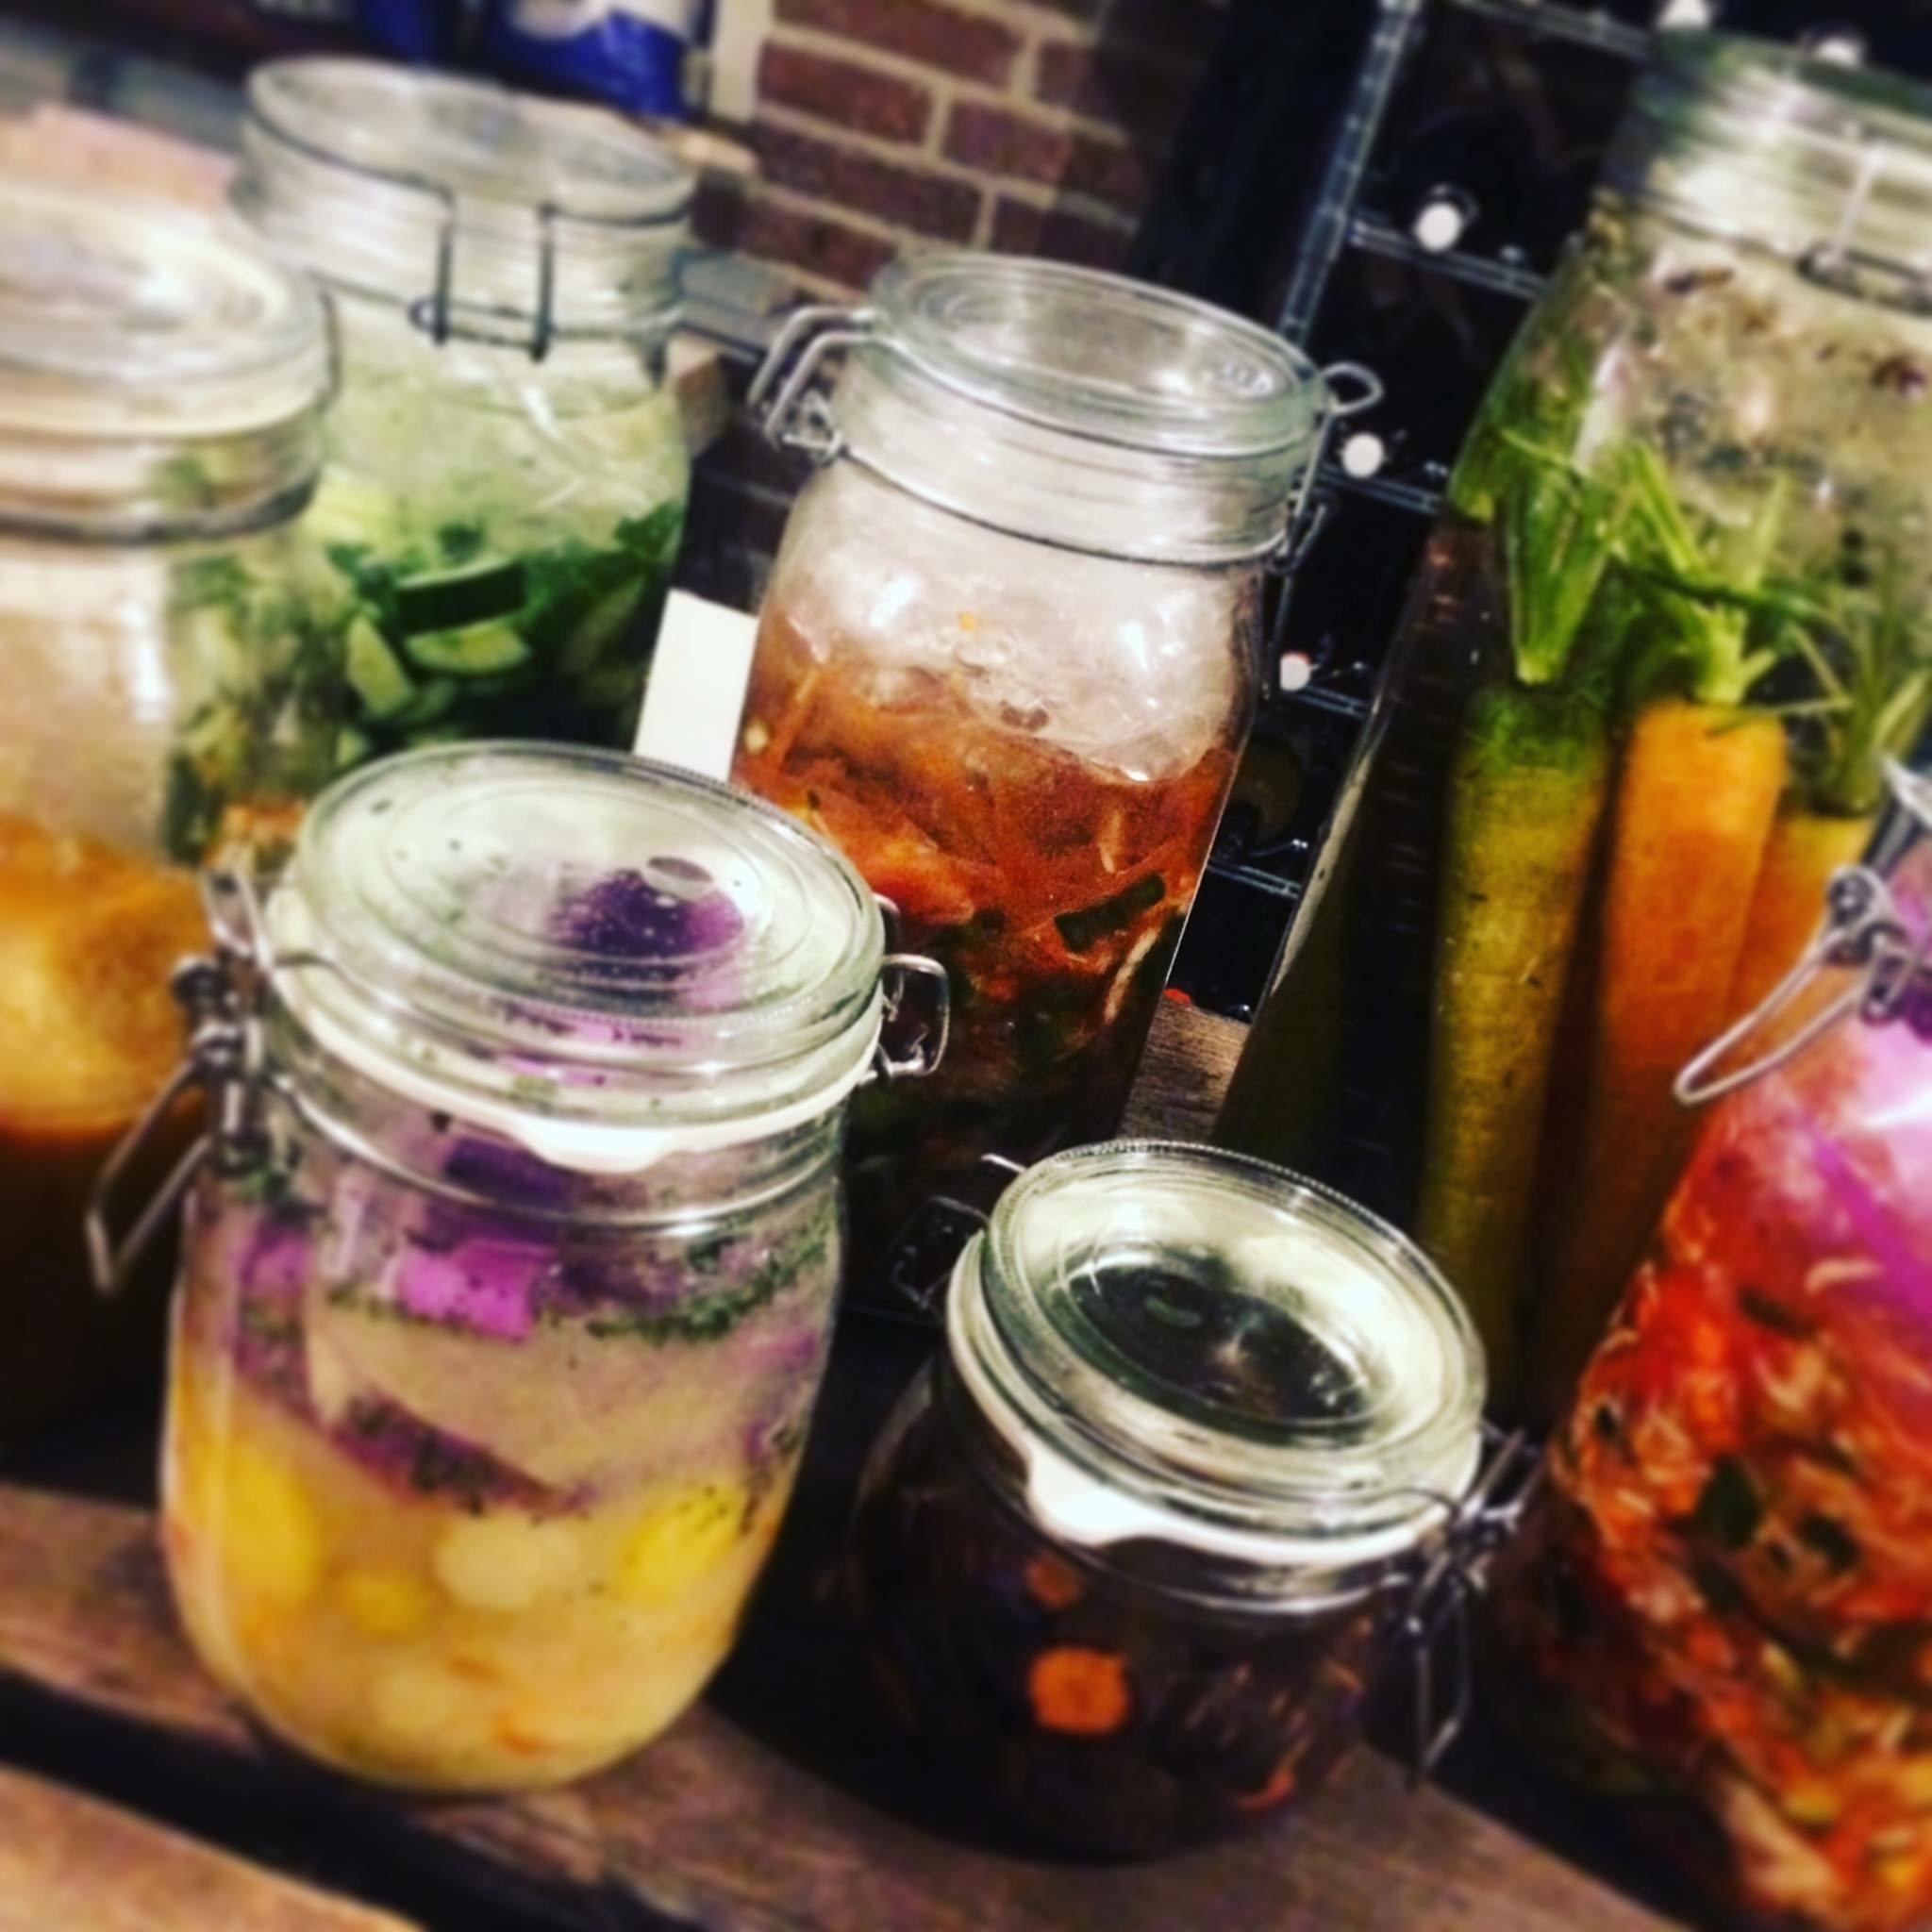 Workshop fermenteren + desembrood @ SmaakPark | Ede | Gelderland | Nederland